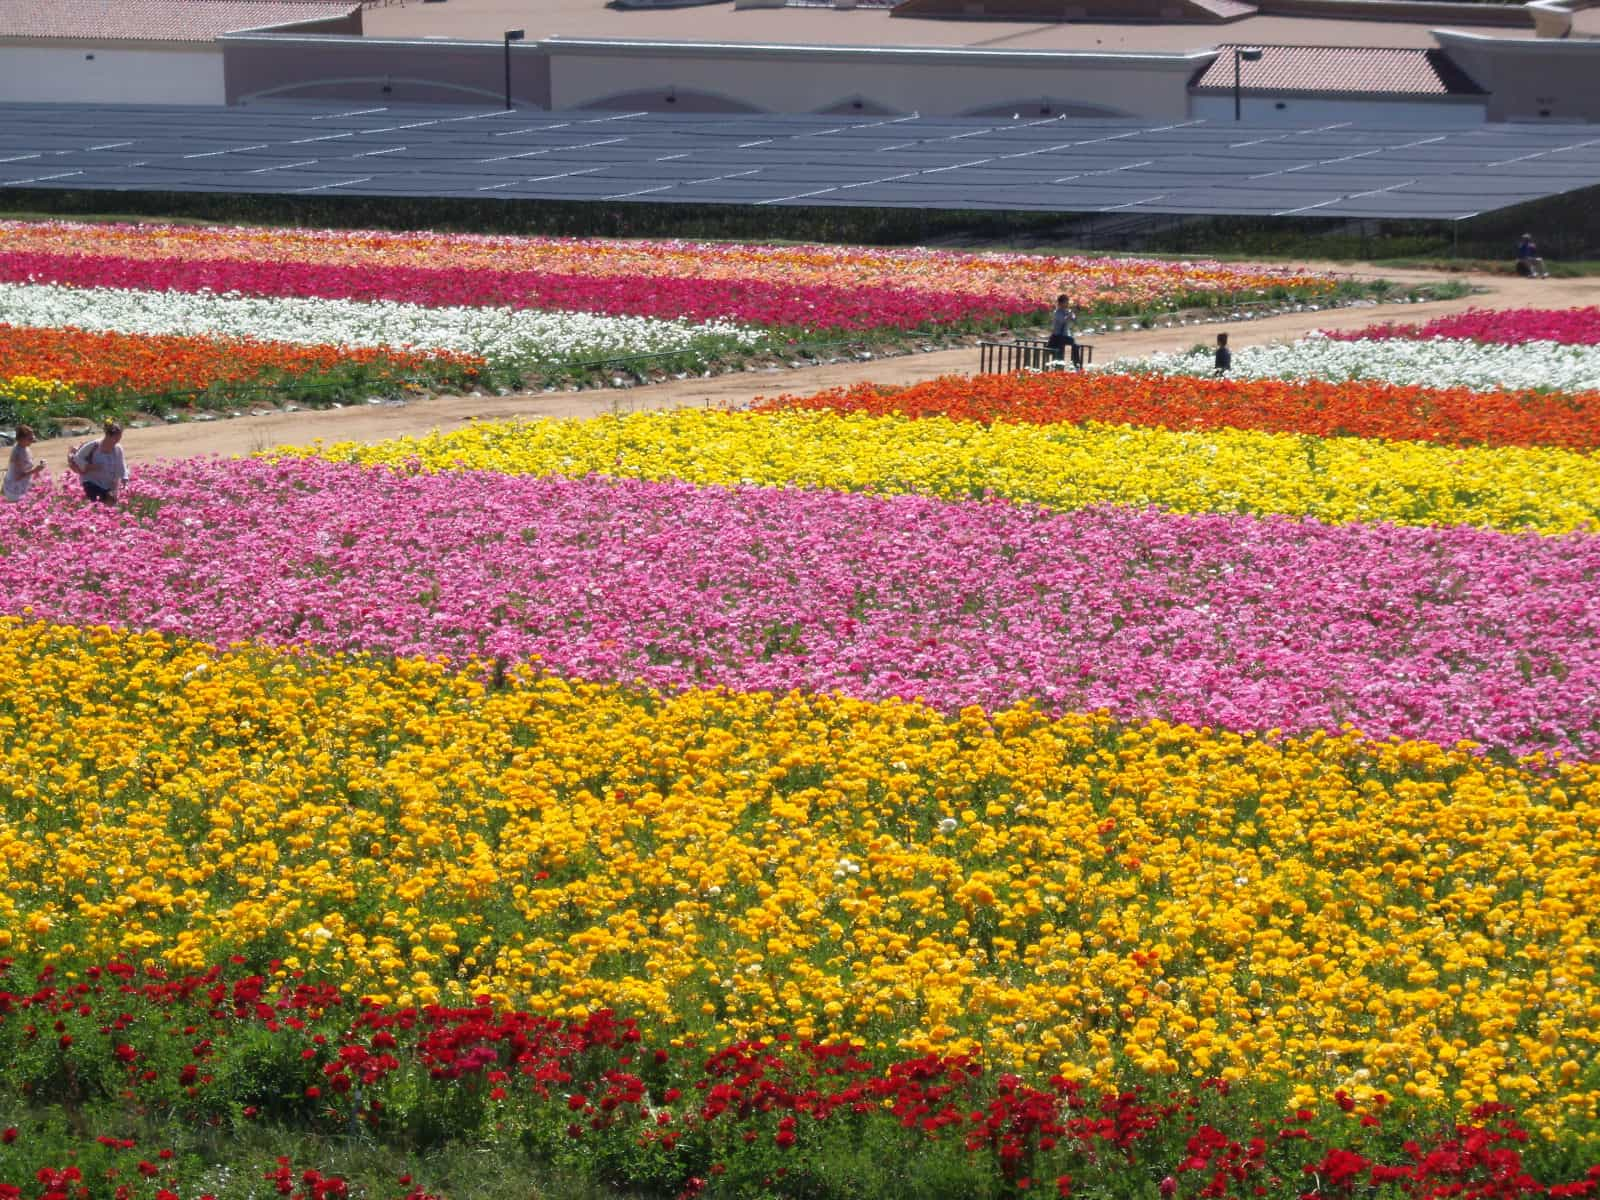 DAY 7 – The Flower Fields in Carlsbad